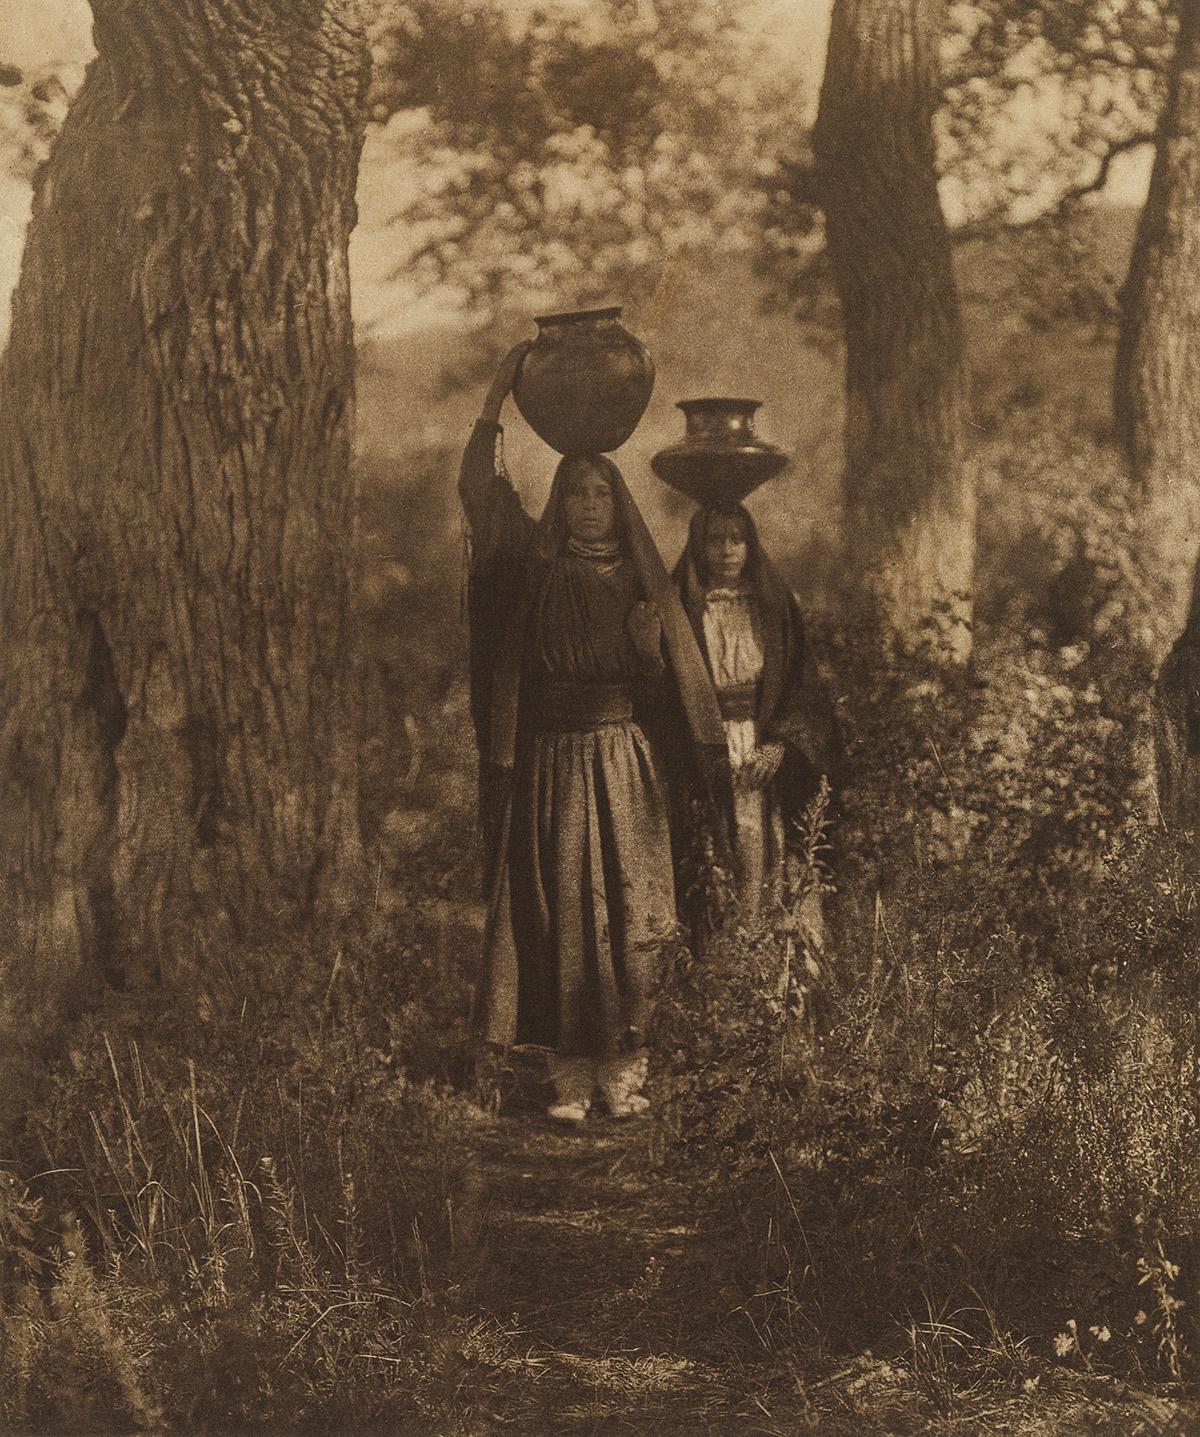 EDWARD S. CURTIS (1868-1952) The North American Indian, Portfolio XVI [Tiwa and Keres].